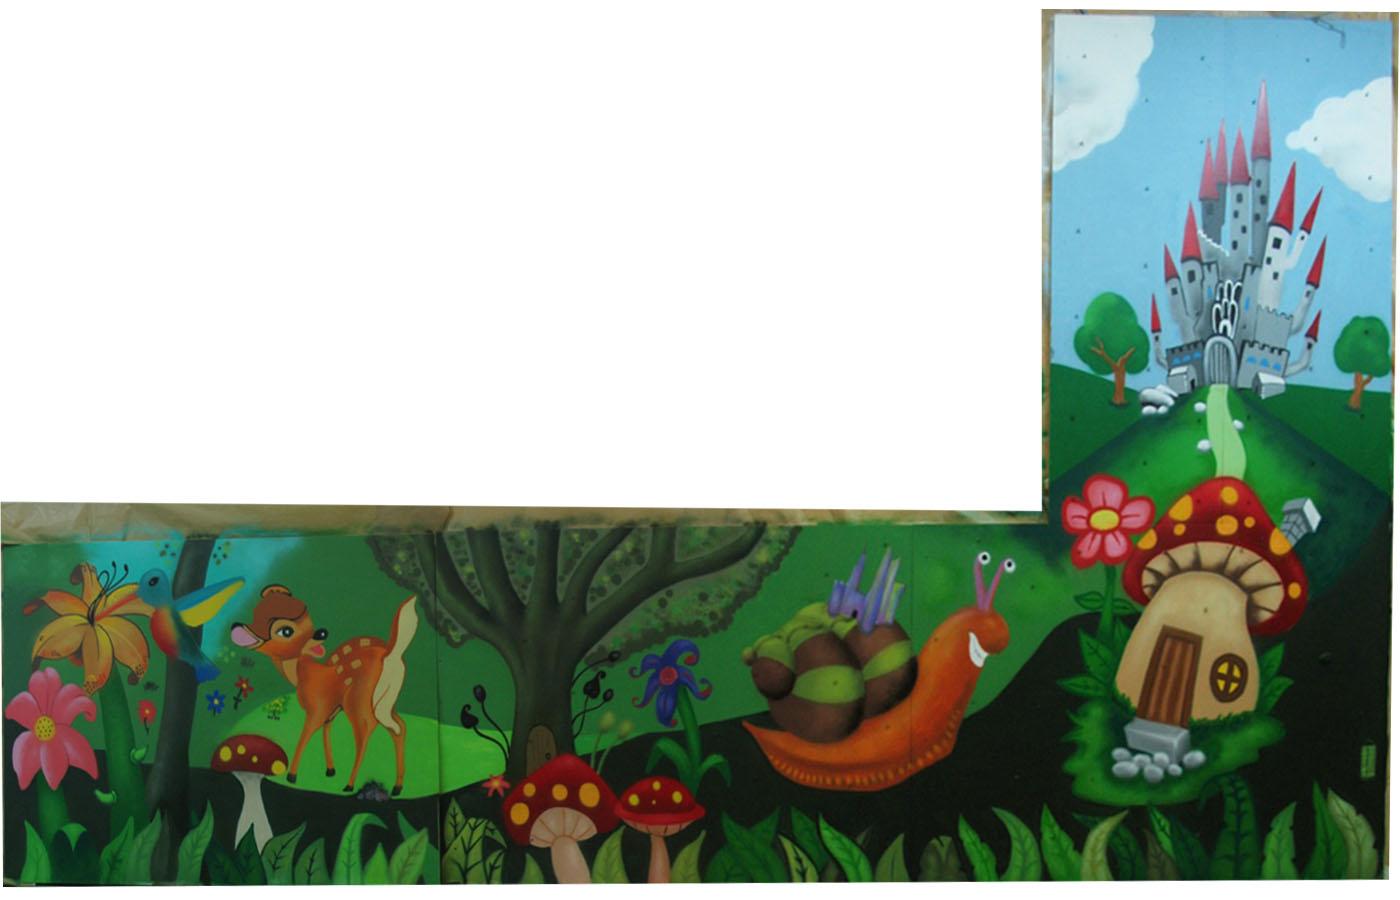 mural graffiti Ludoteca tris tras